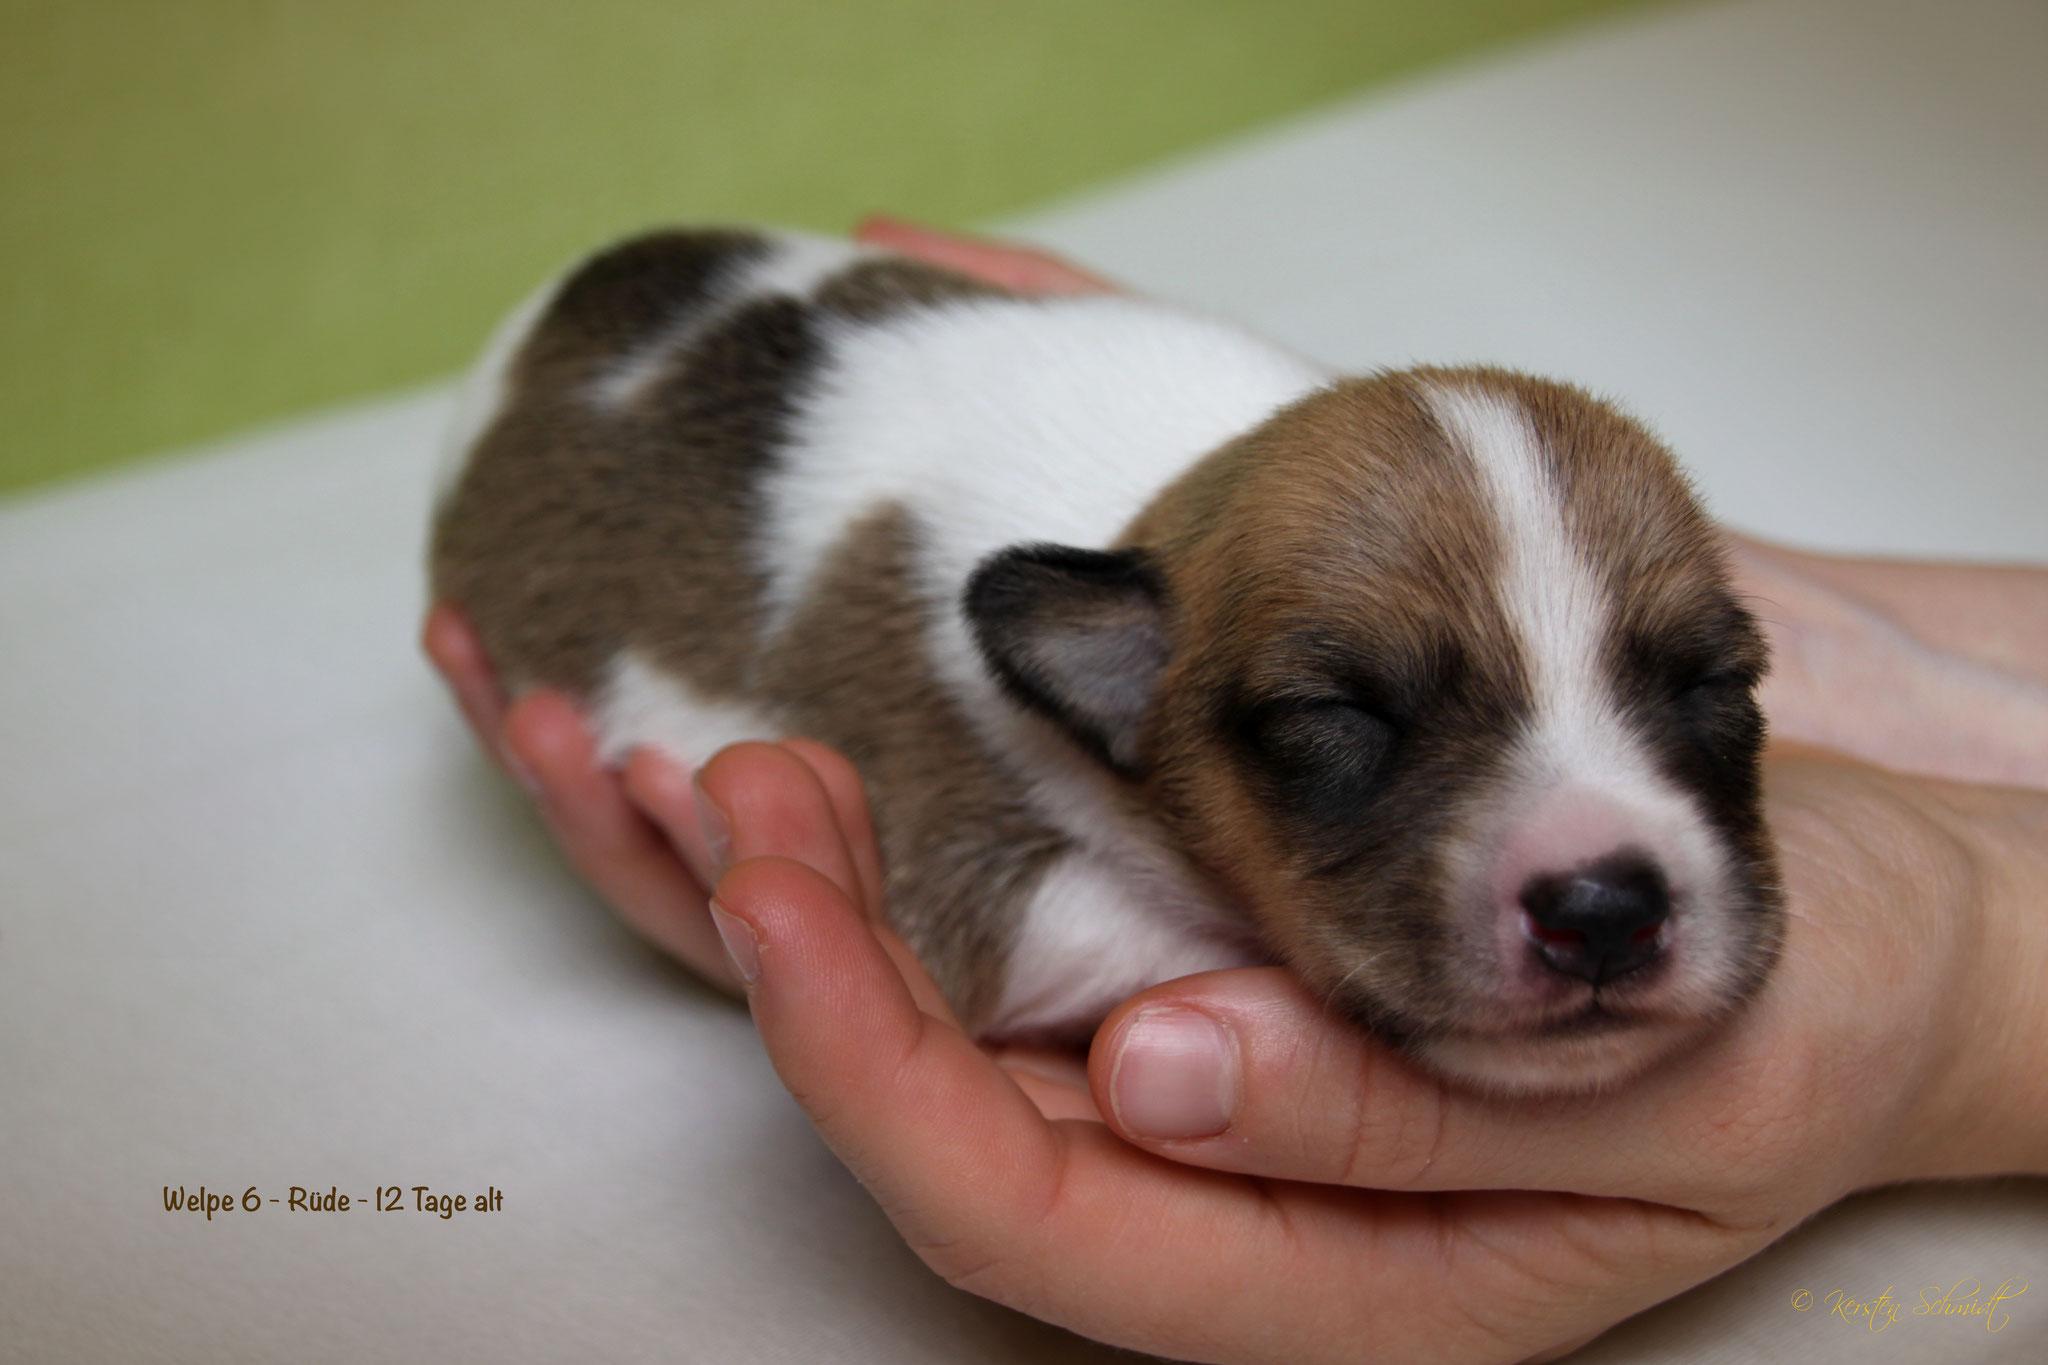 Charming Dexter 12 Tage alt